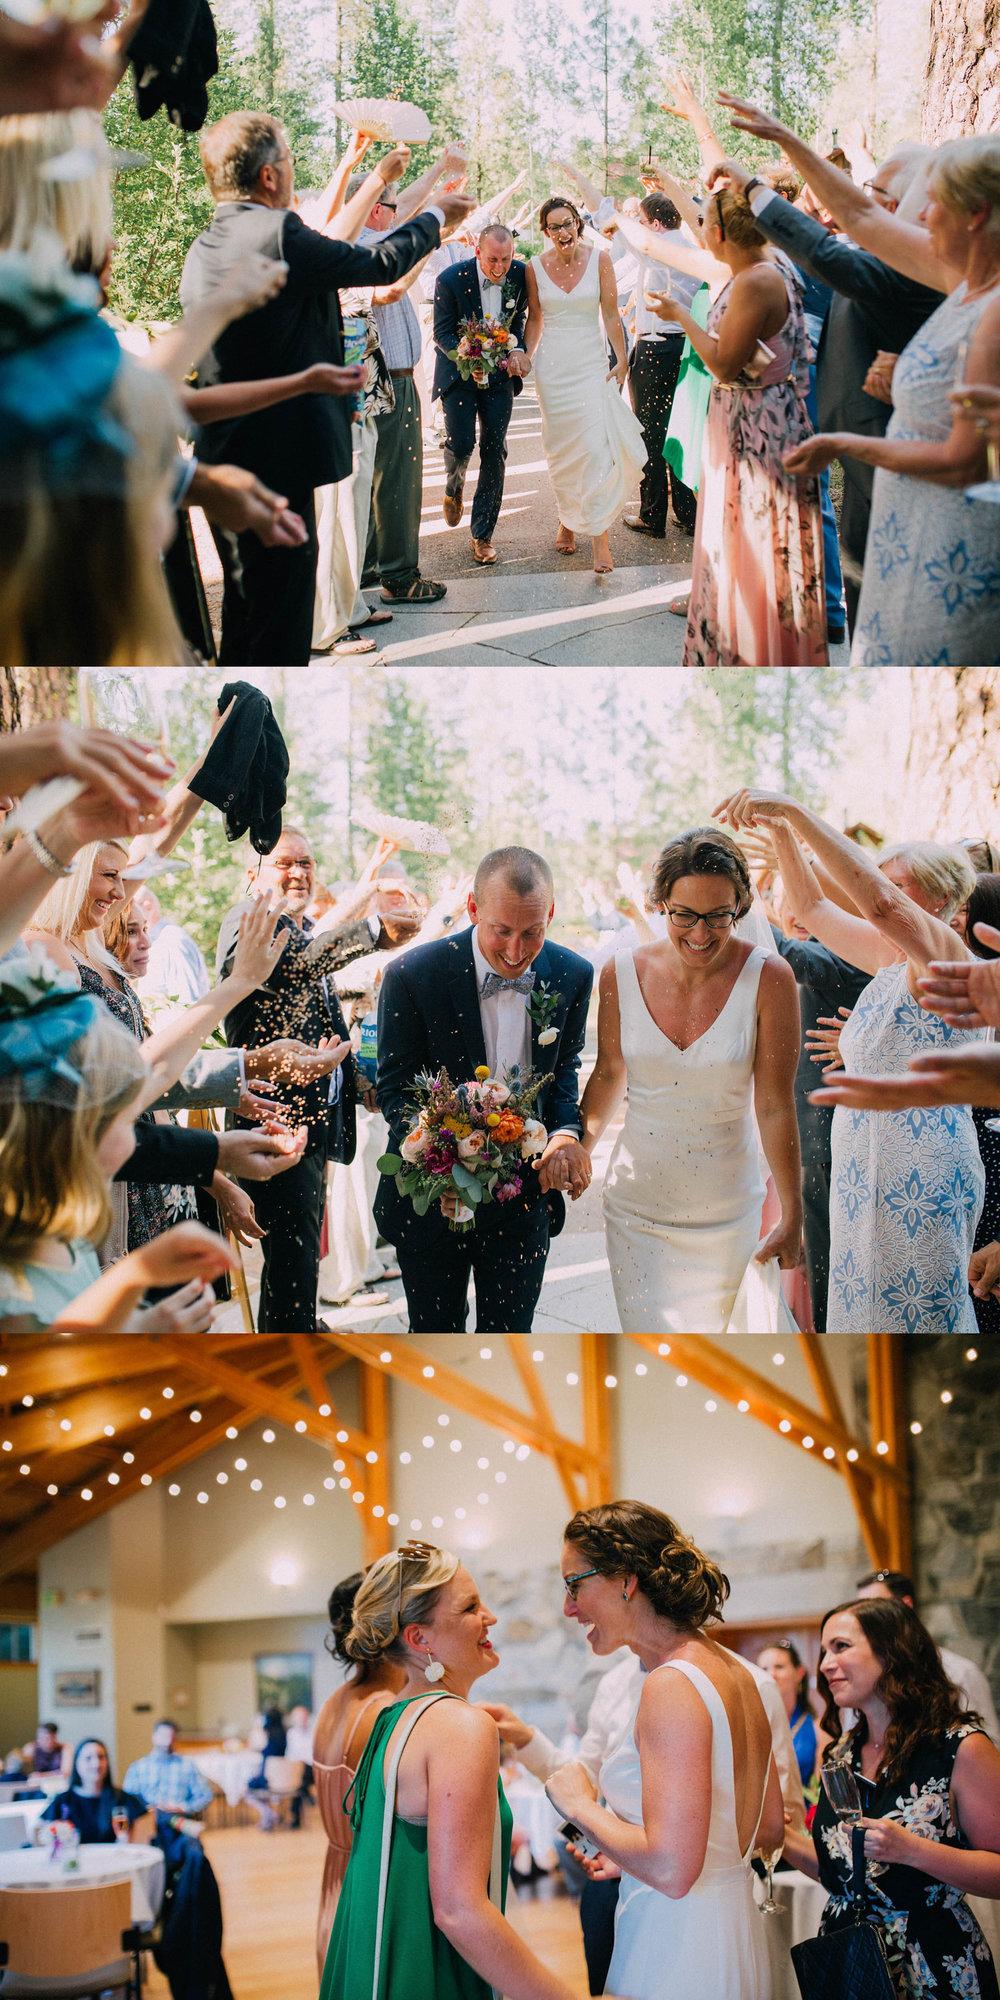 seattle+and+pacific+northwest+wedding+photographer+western+washington+wedding-20.jpg